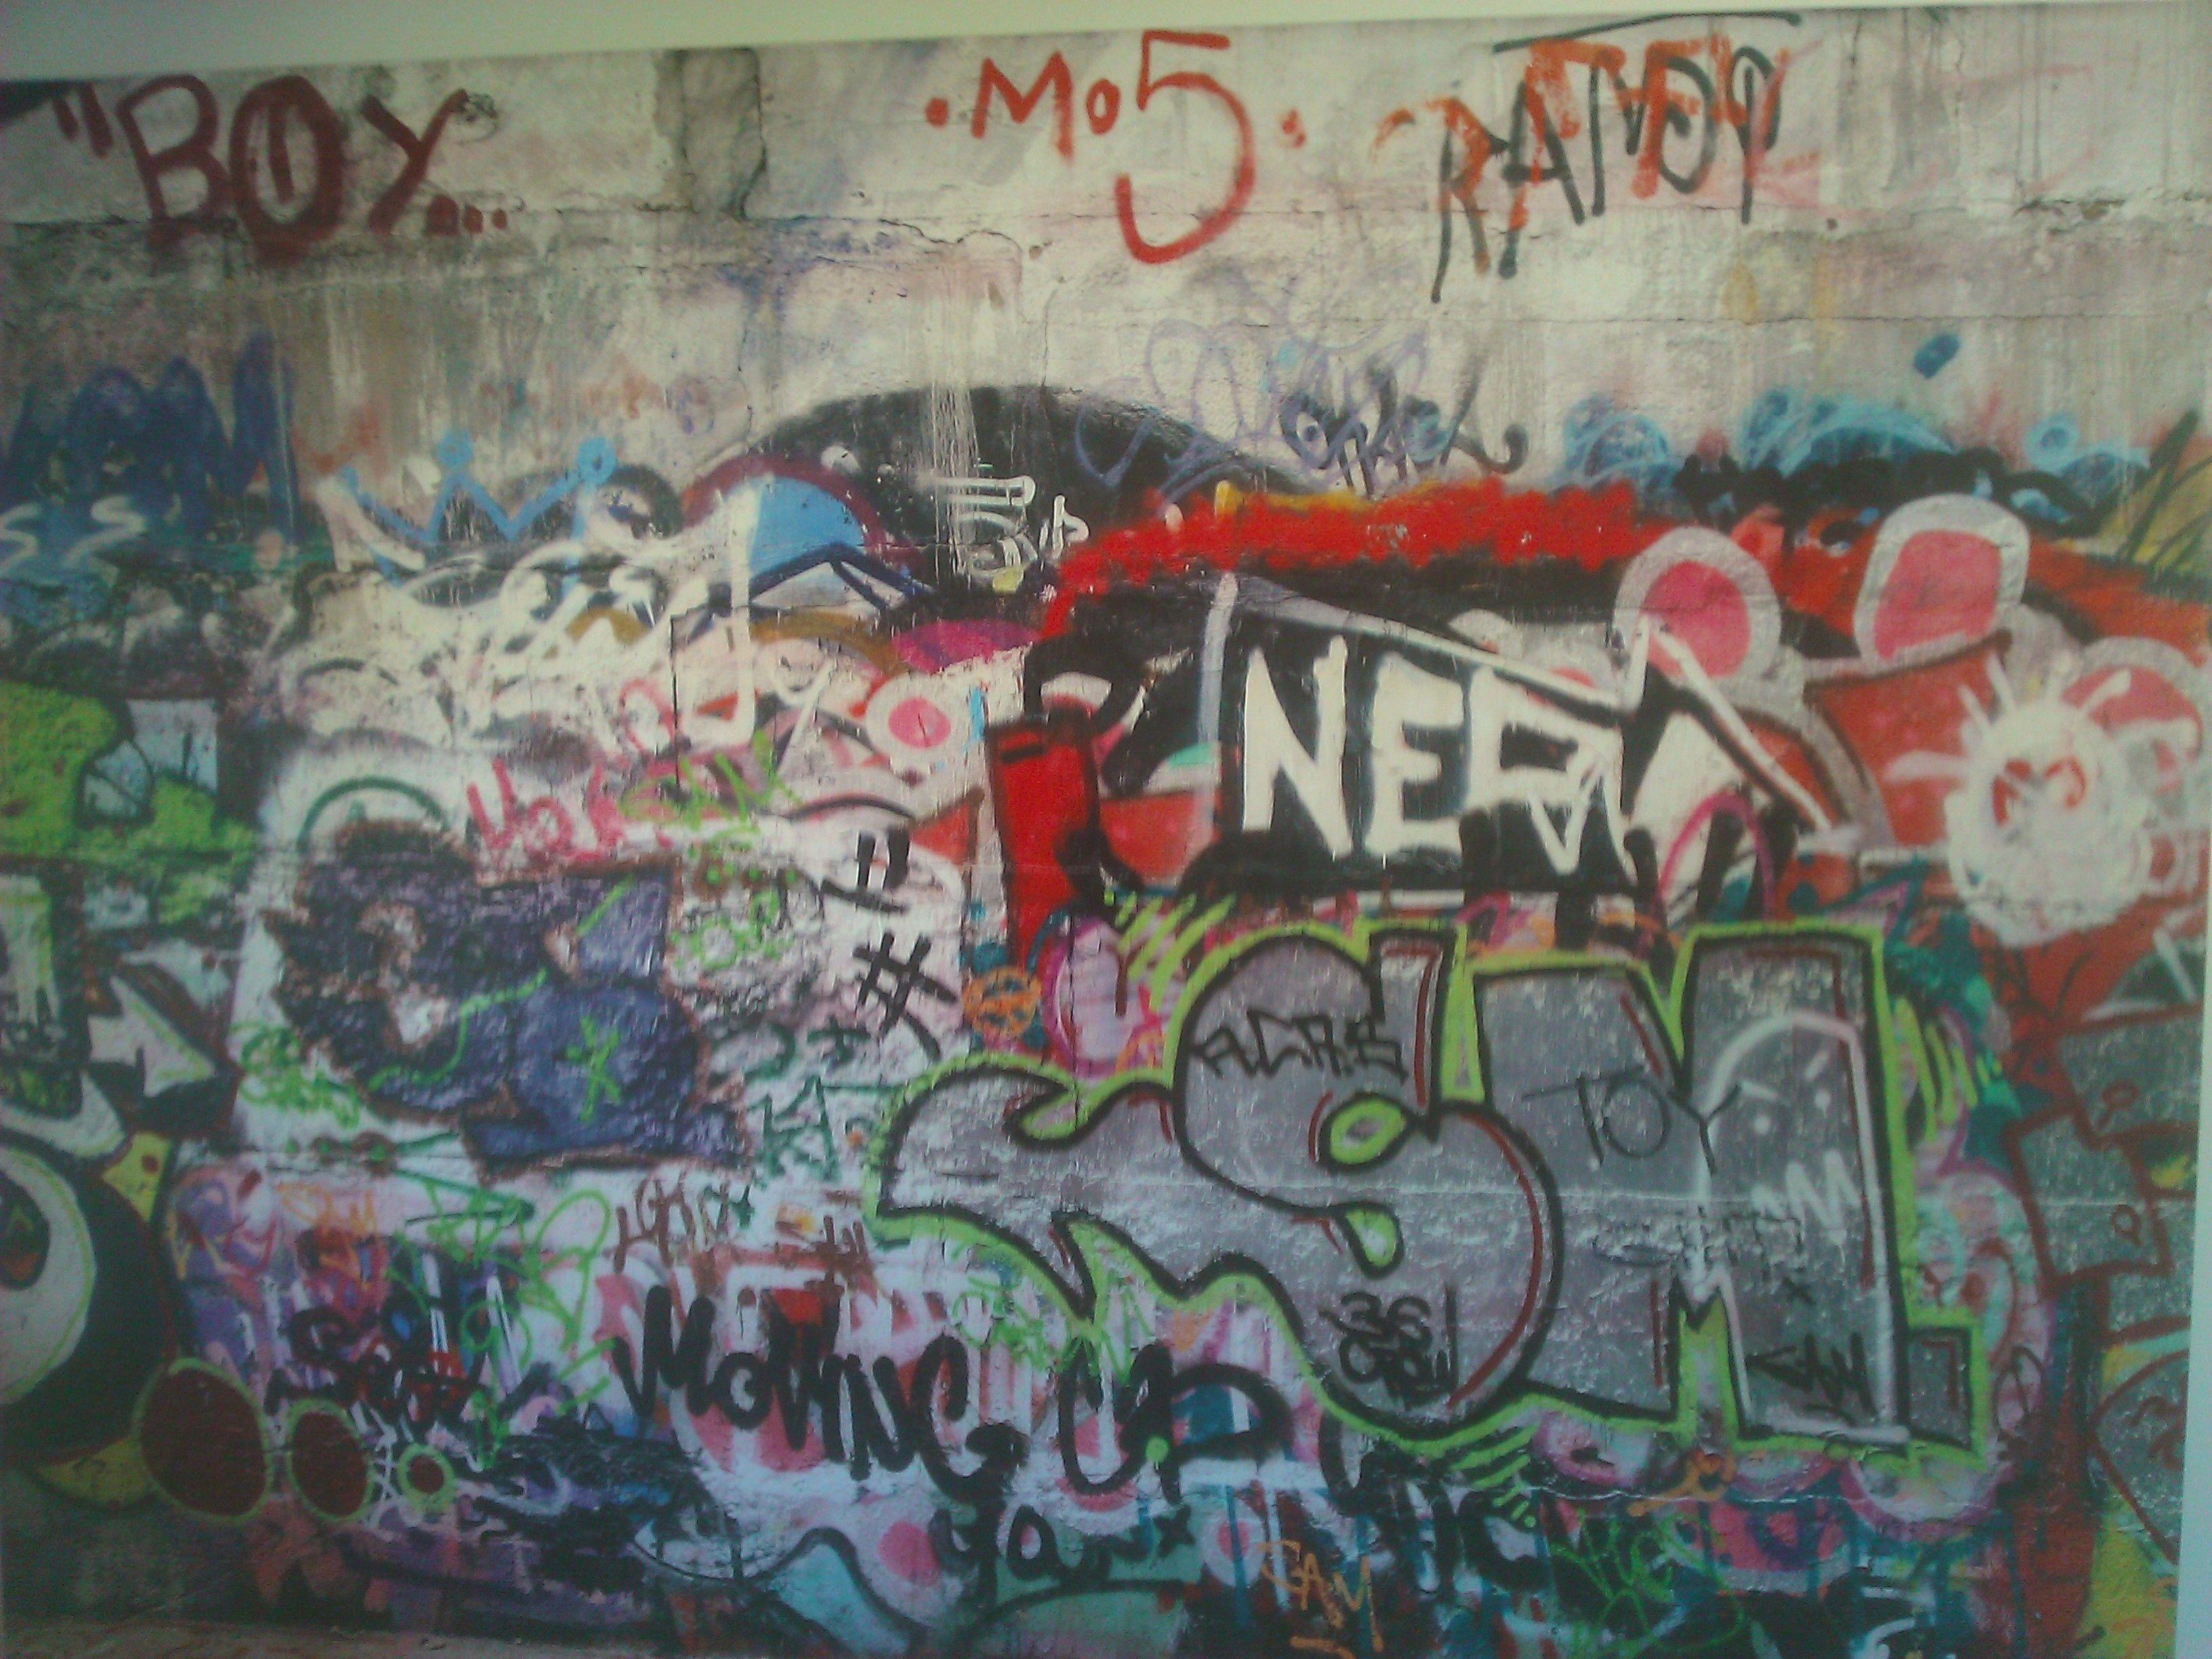 Grafitti Wallpaper Mural In 2020 Removable Wall Murals Graffiti Mural